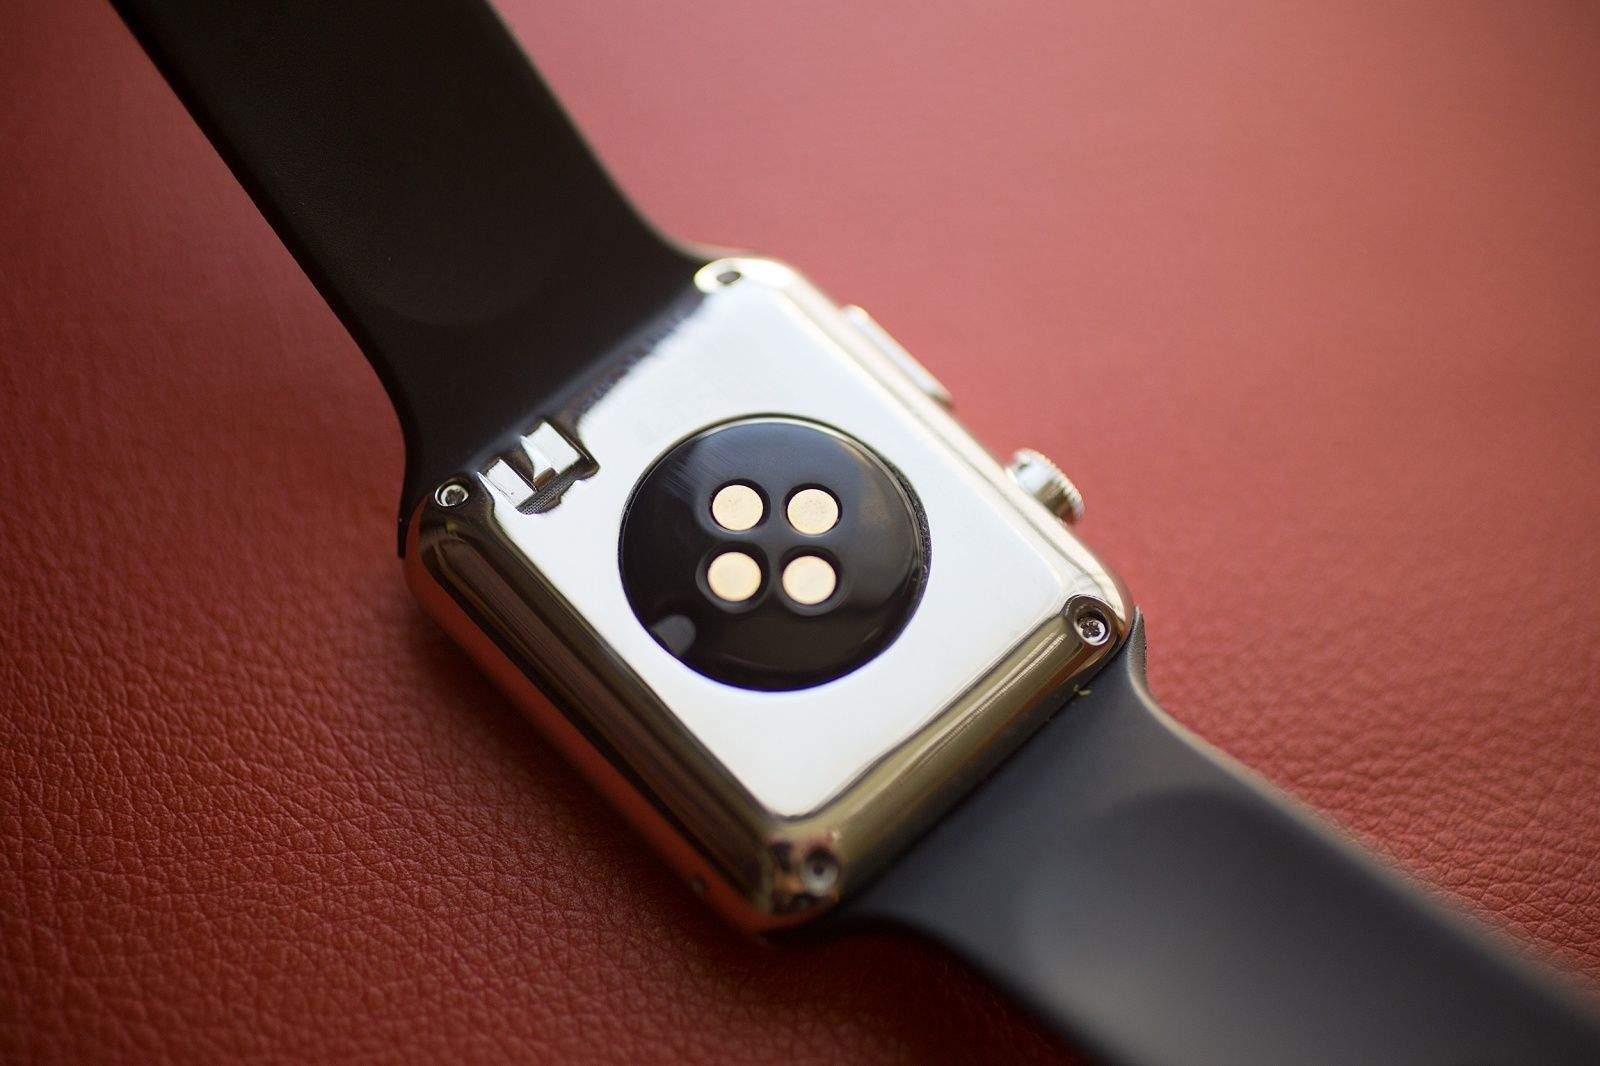 Fake Apple Watch Prototype Sells For Hundreds On EBay